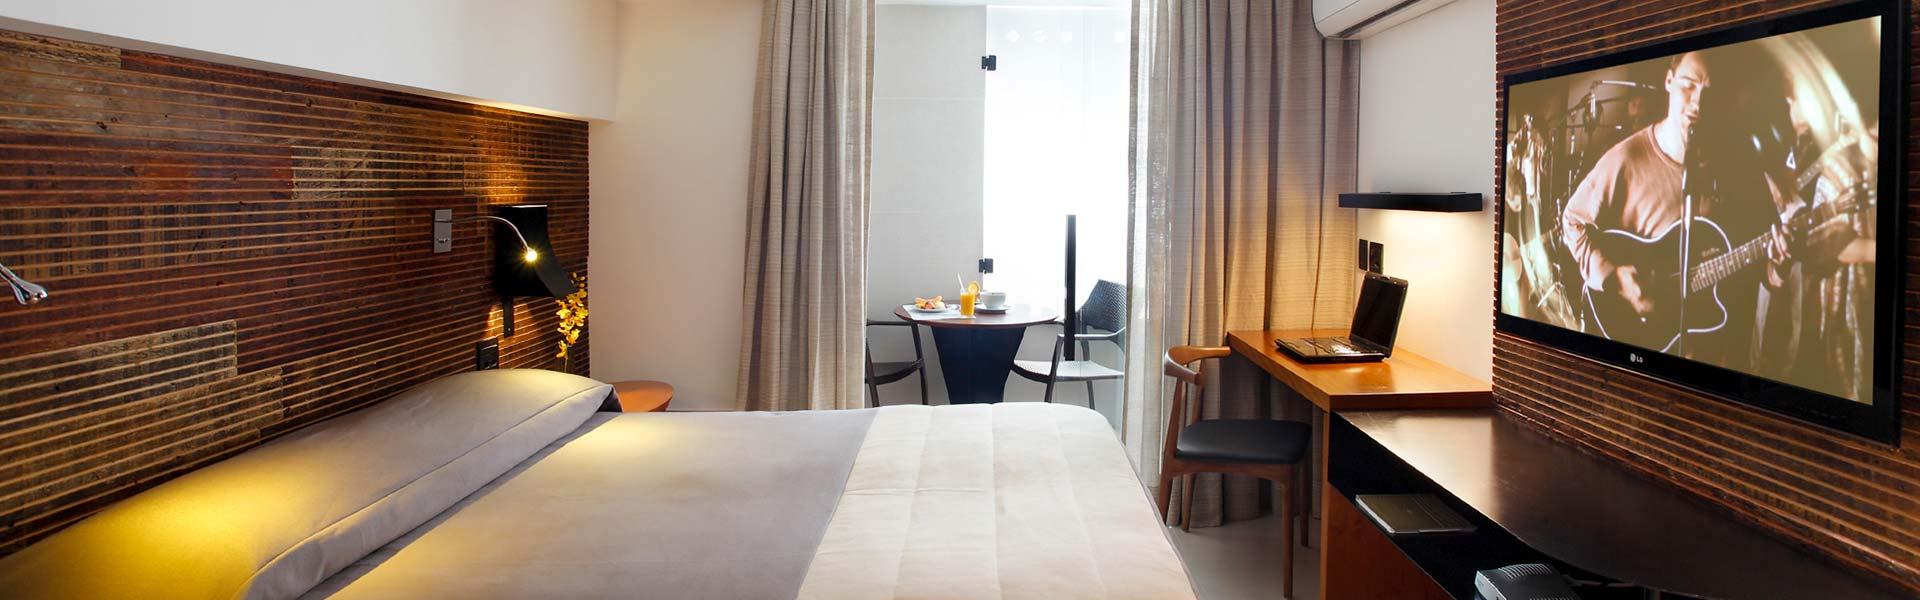 slider-page-ritz-plaza-hotel-leblon-acomodacoes